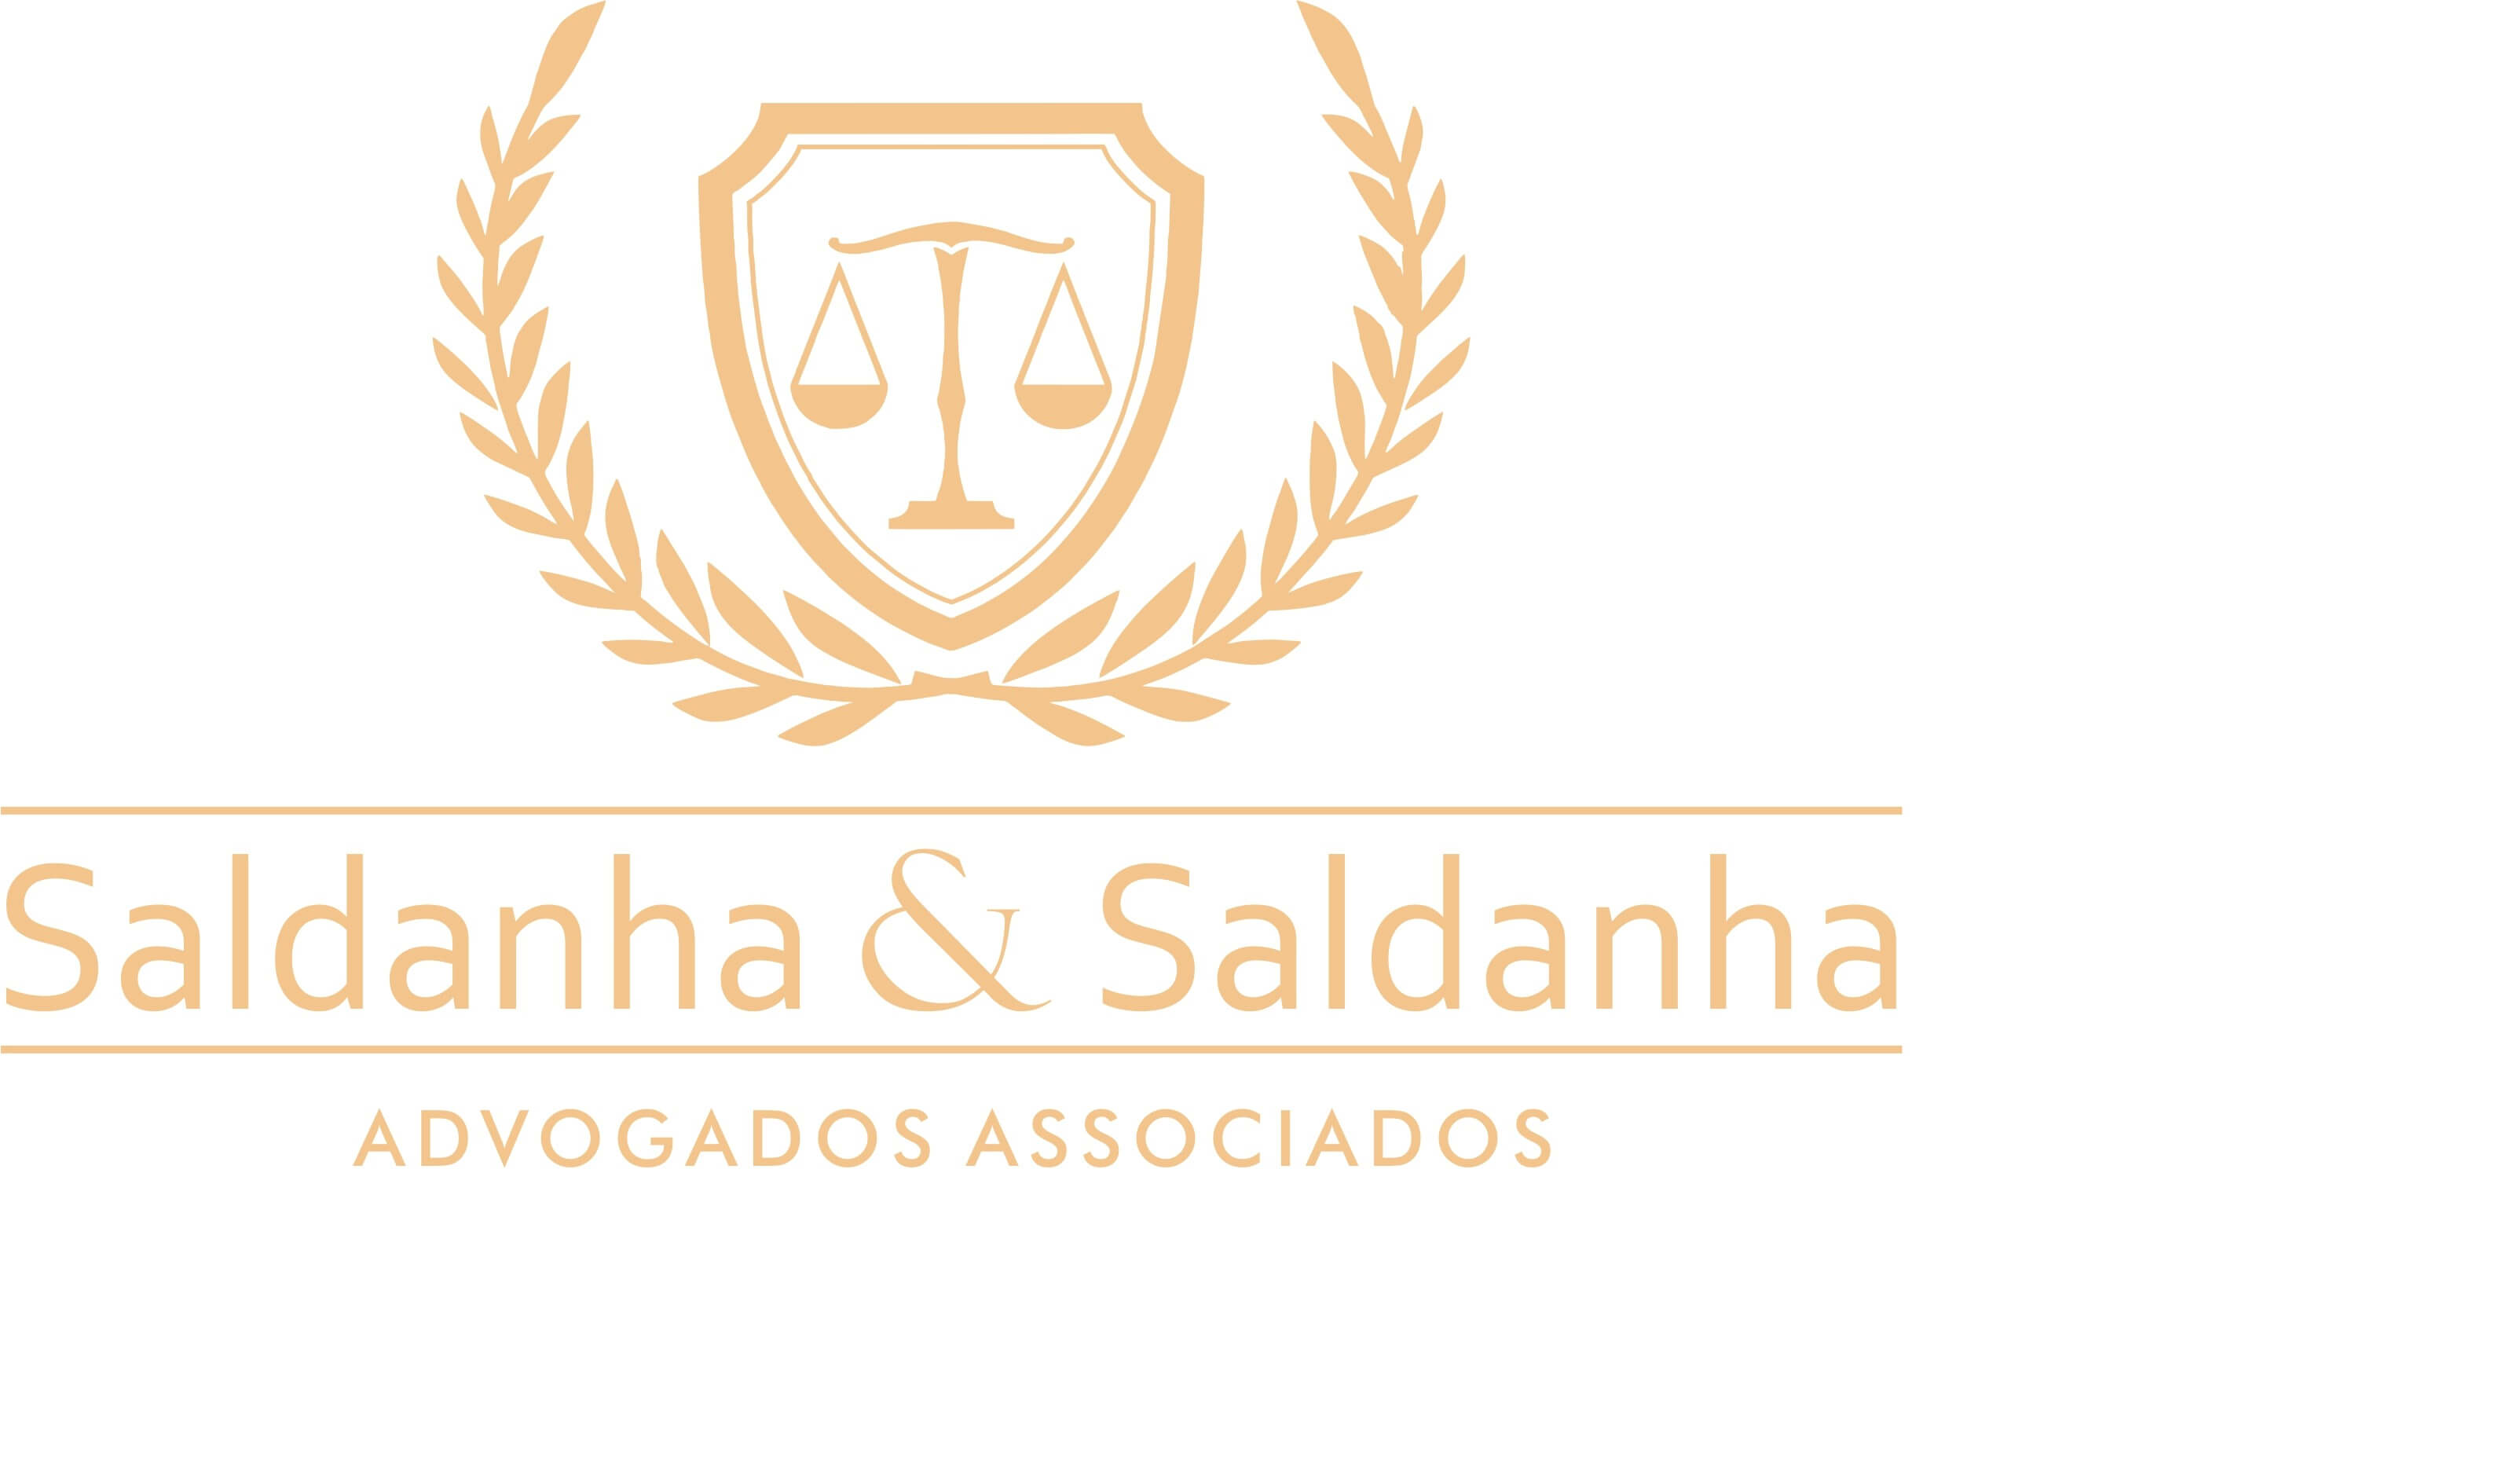 SALDANHA